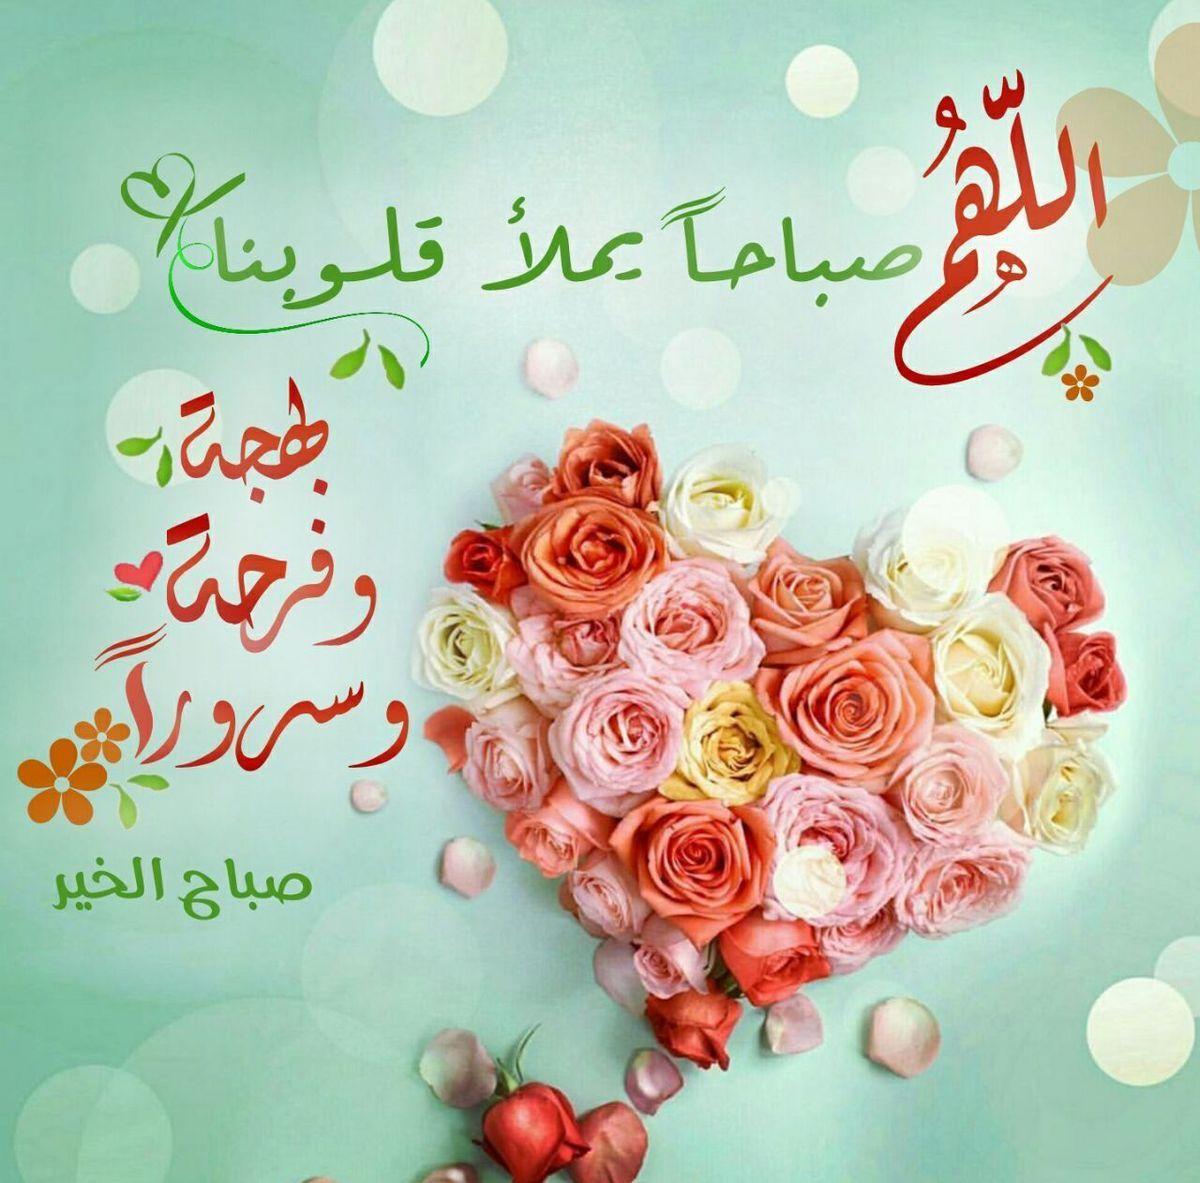 Pin By Oz On صباح الخير Good Morning Images Flowers Morning Messages Good Morning Good Night